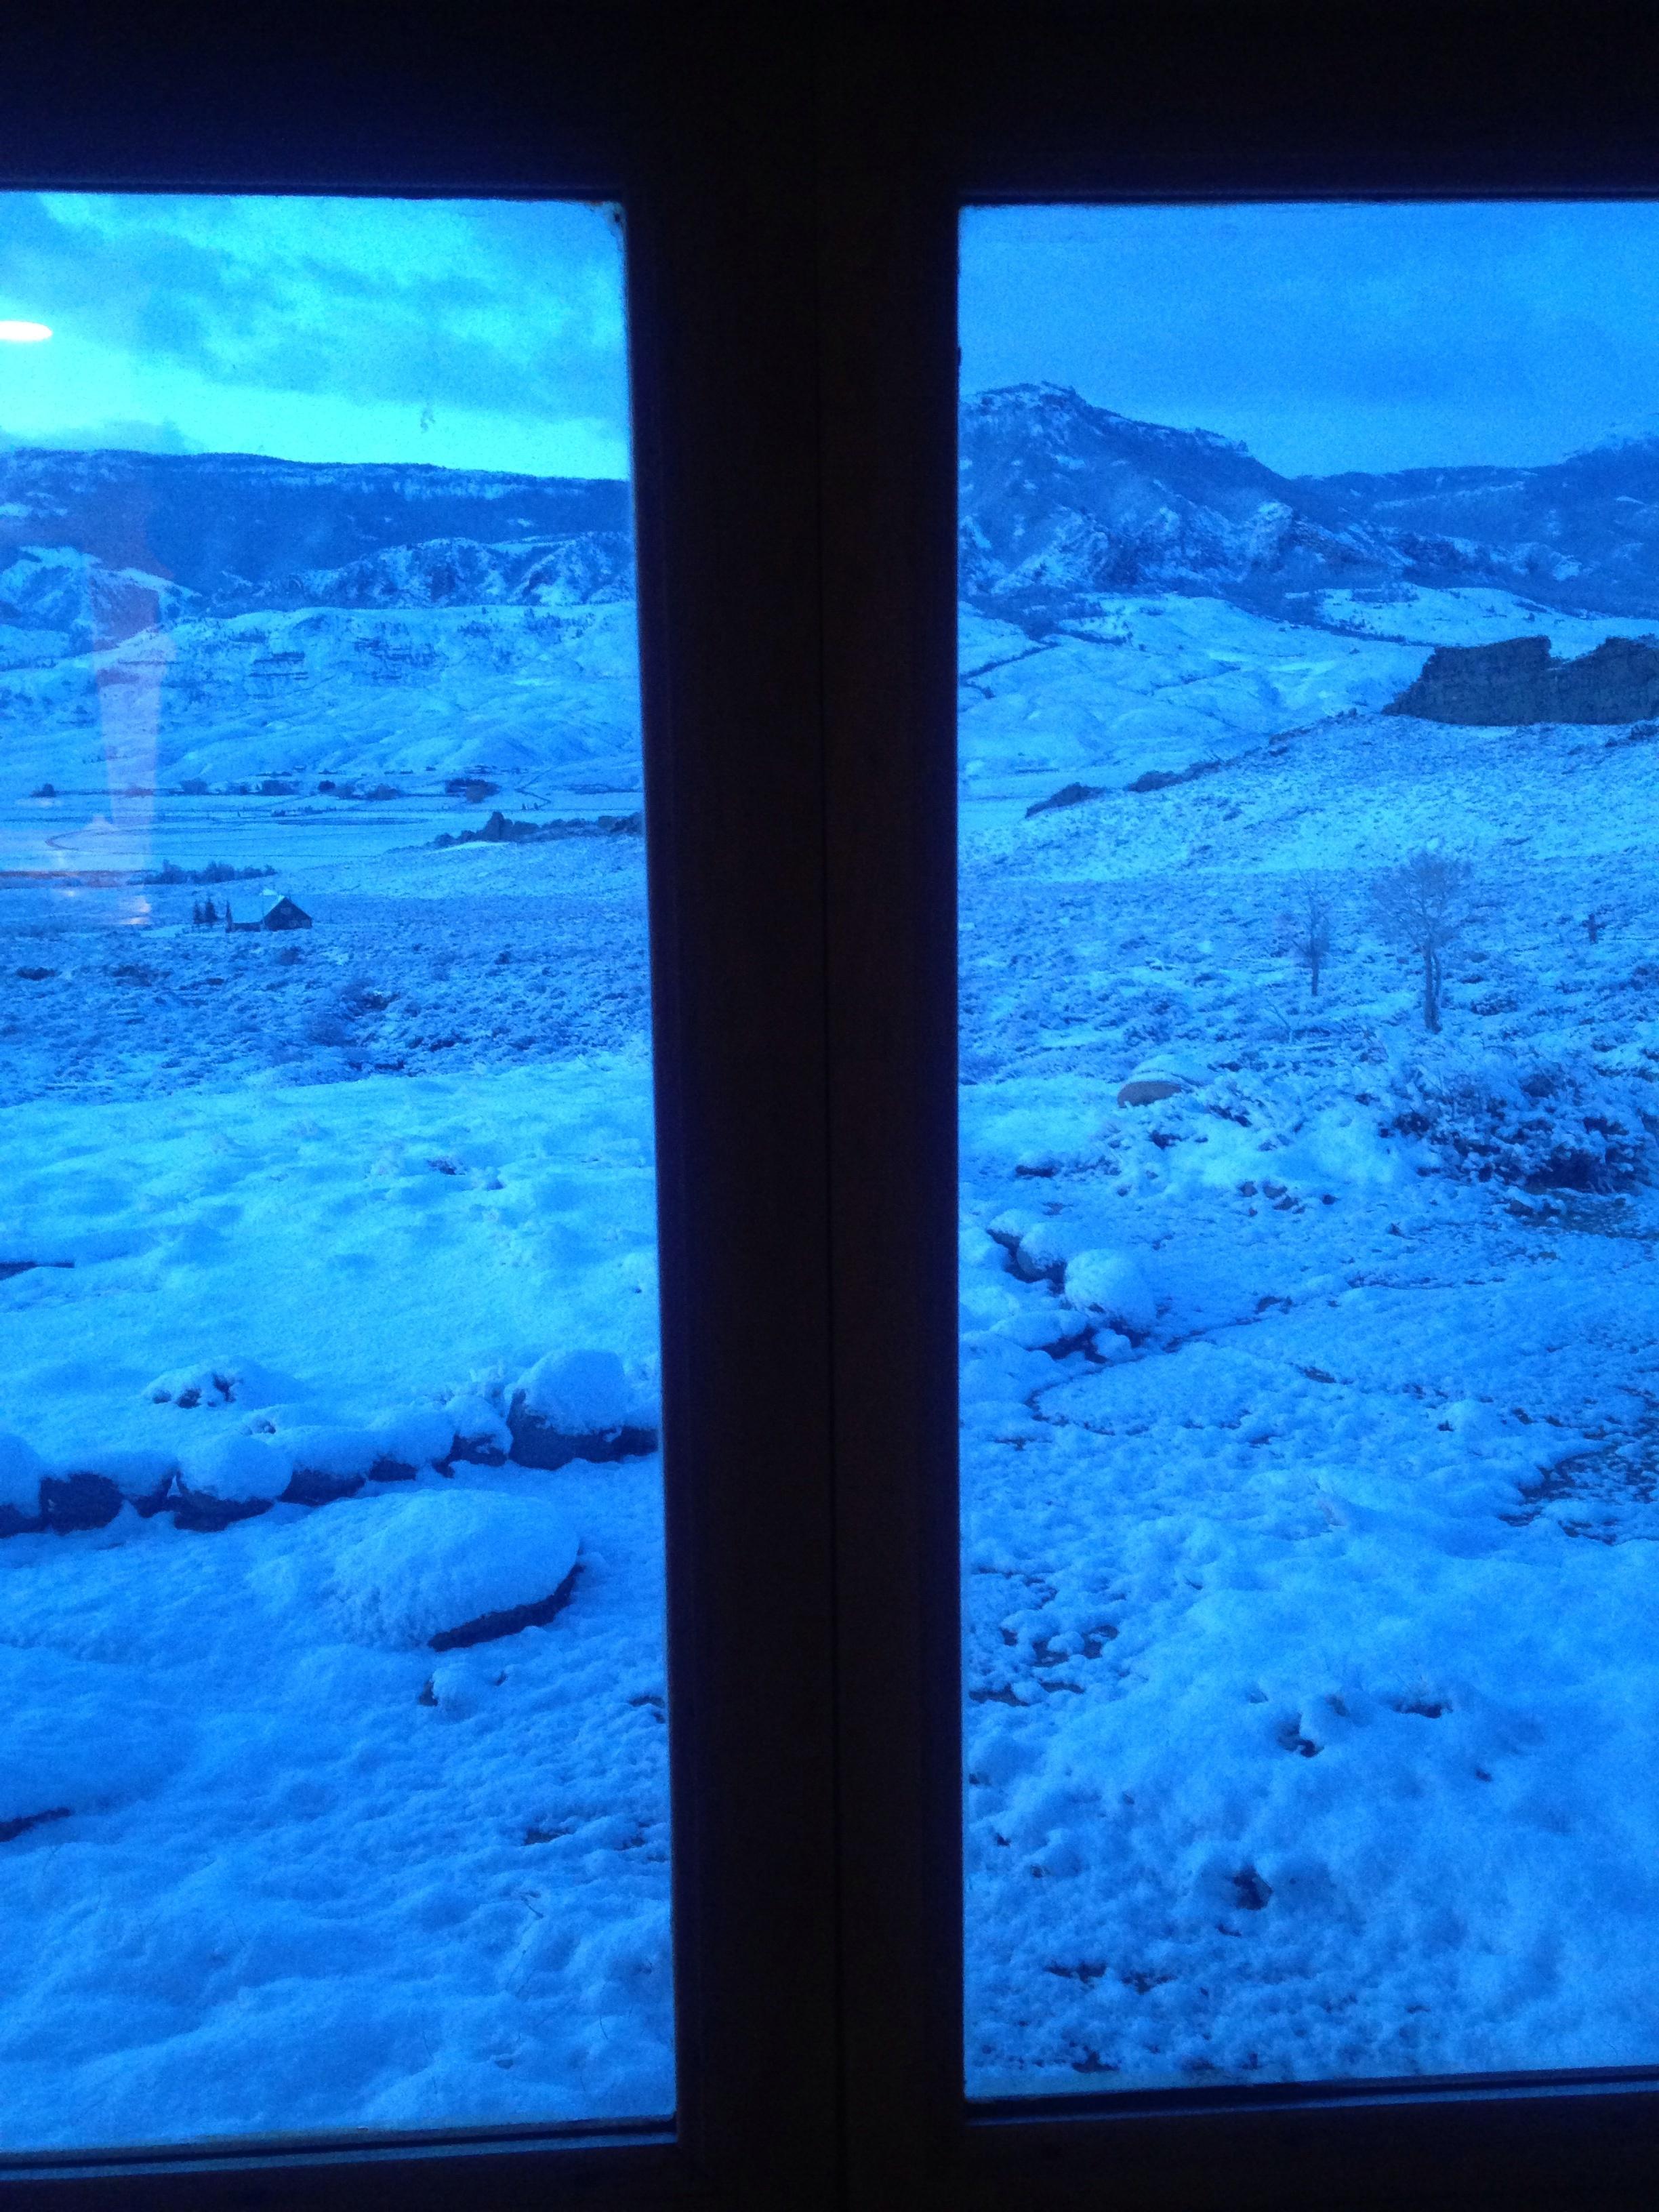 View from cabin at dawn, Wapiti, Wyoming, April 3, 2017.